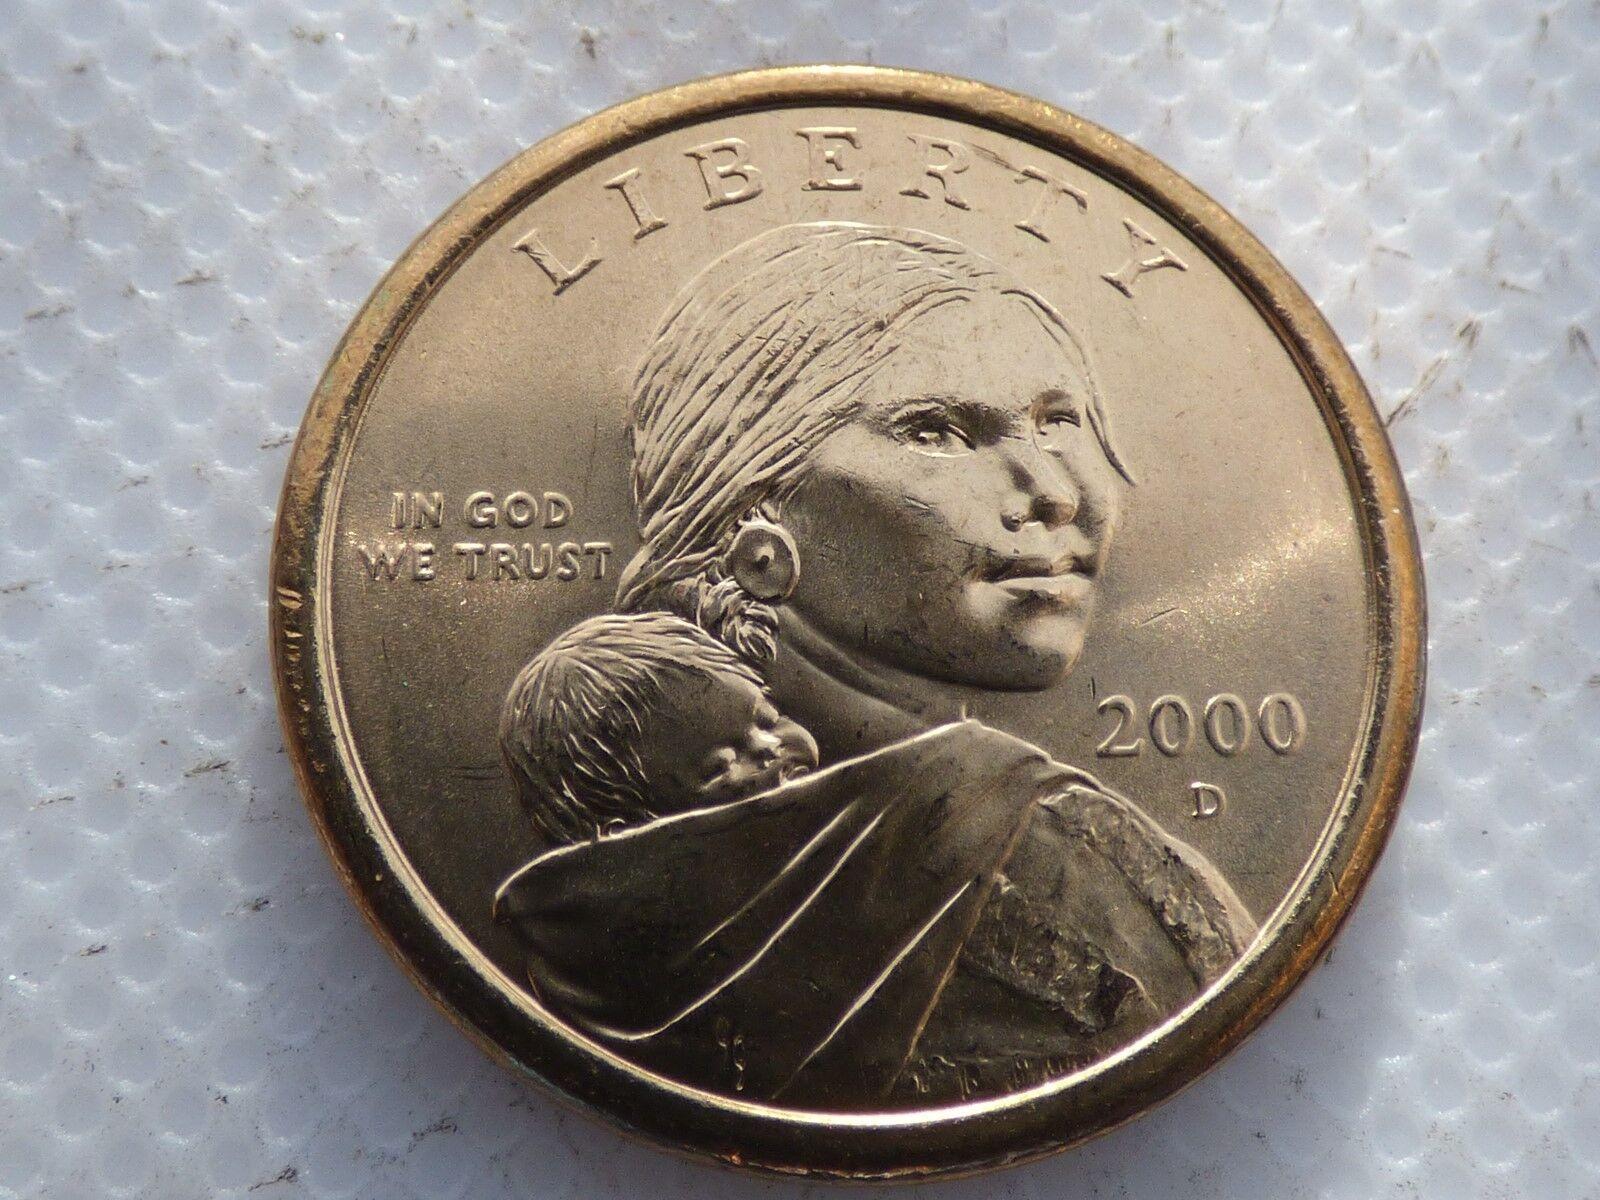 2006 Sac Sacagawea Dollars P/&D from US Mint Rolls